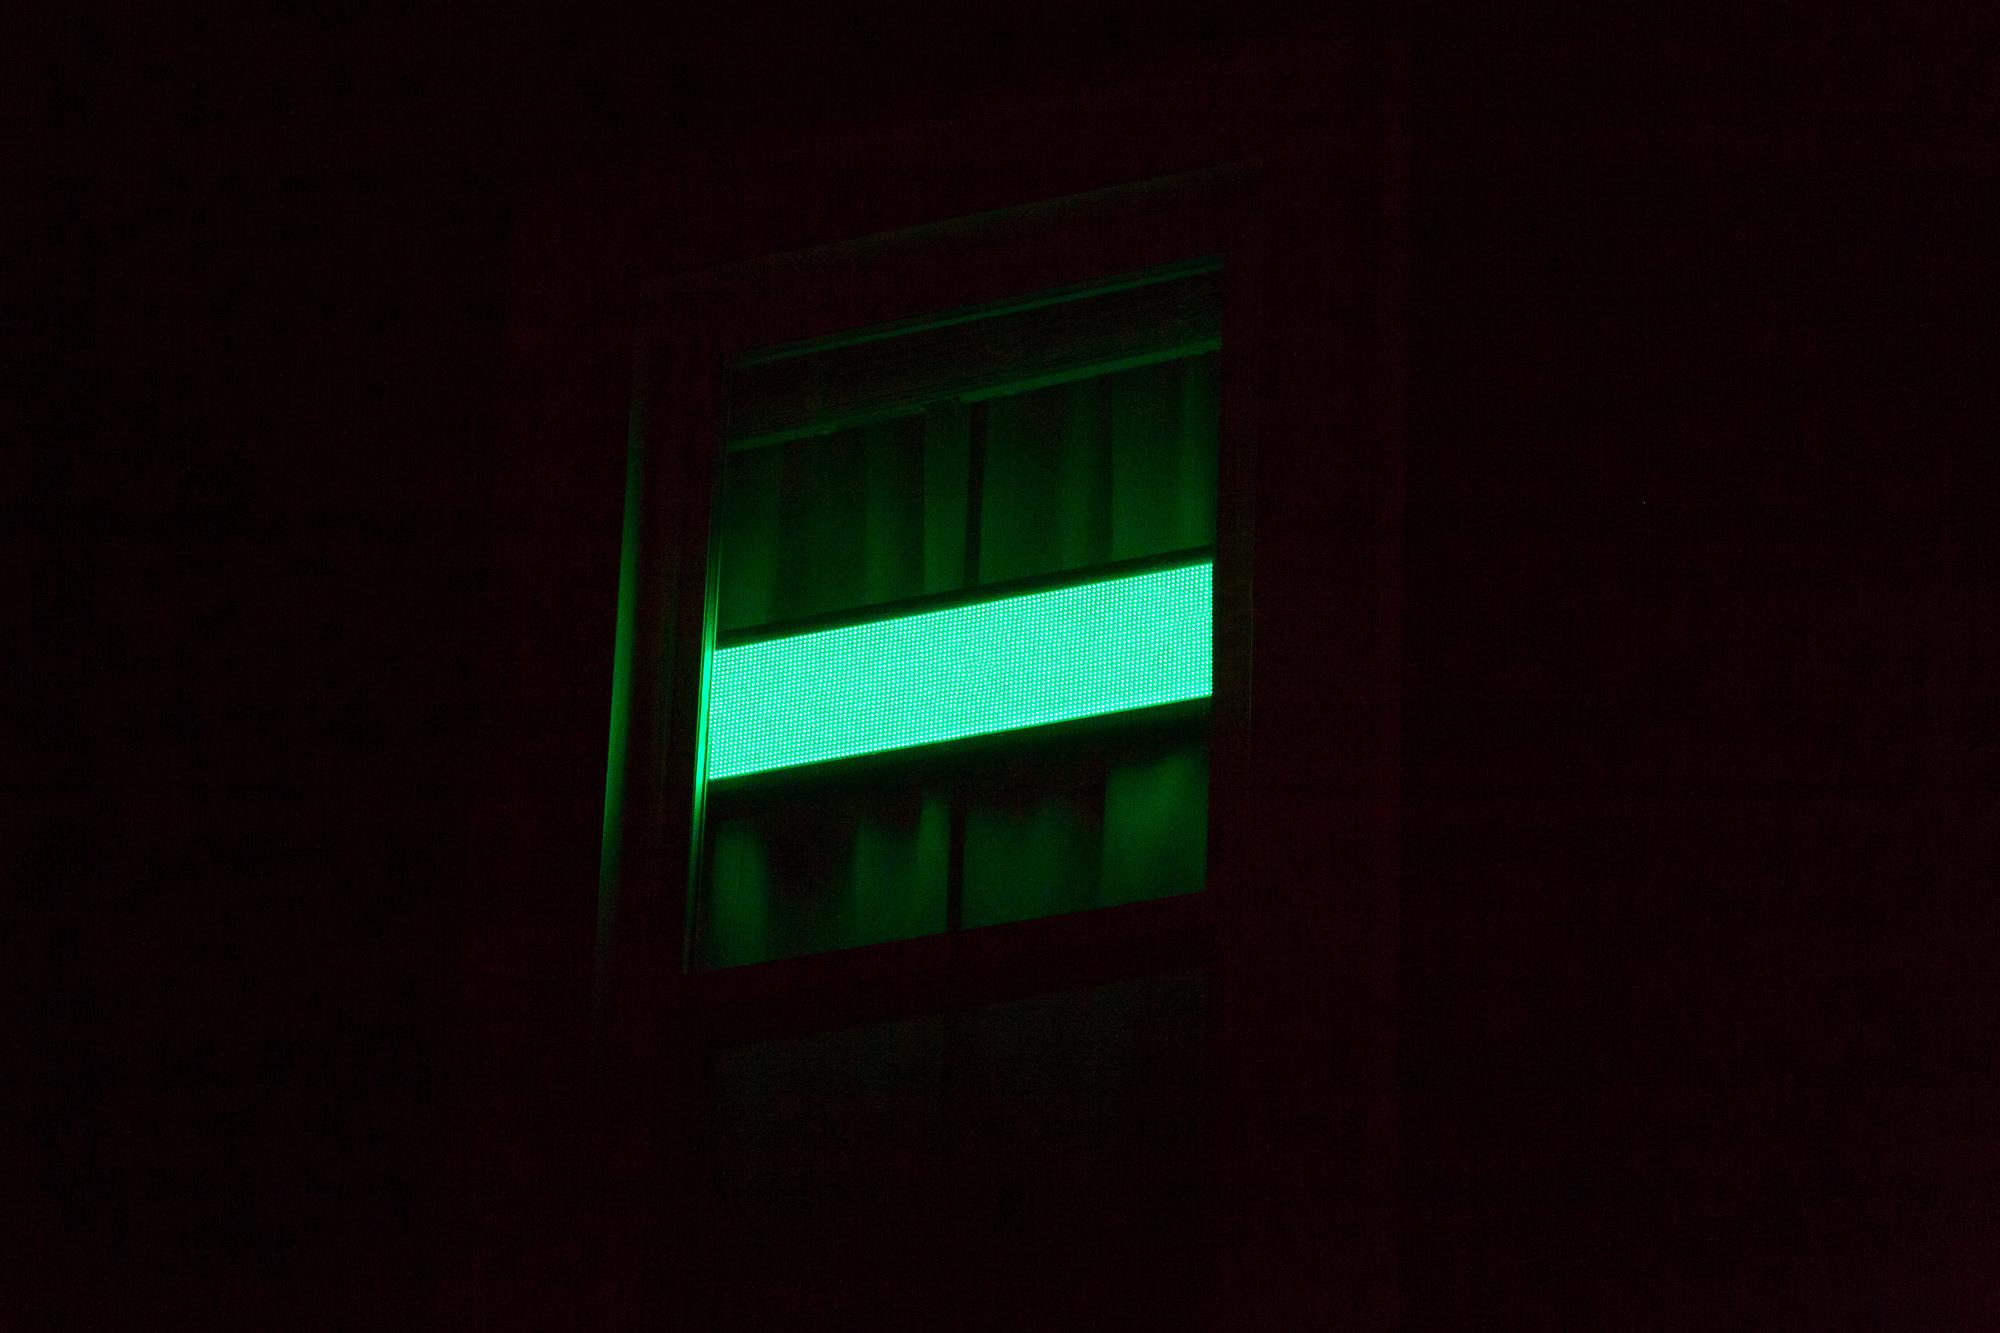 LANDLINE , curatorial LED project (Cicero, IL + Chicago, IL) 2018 - current